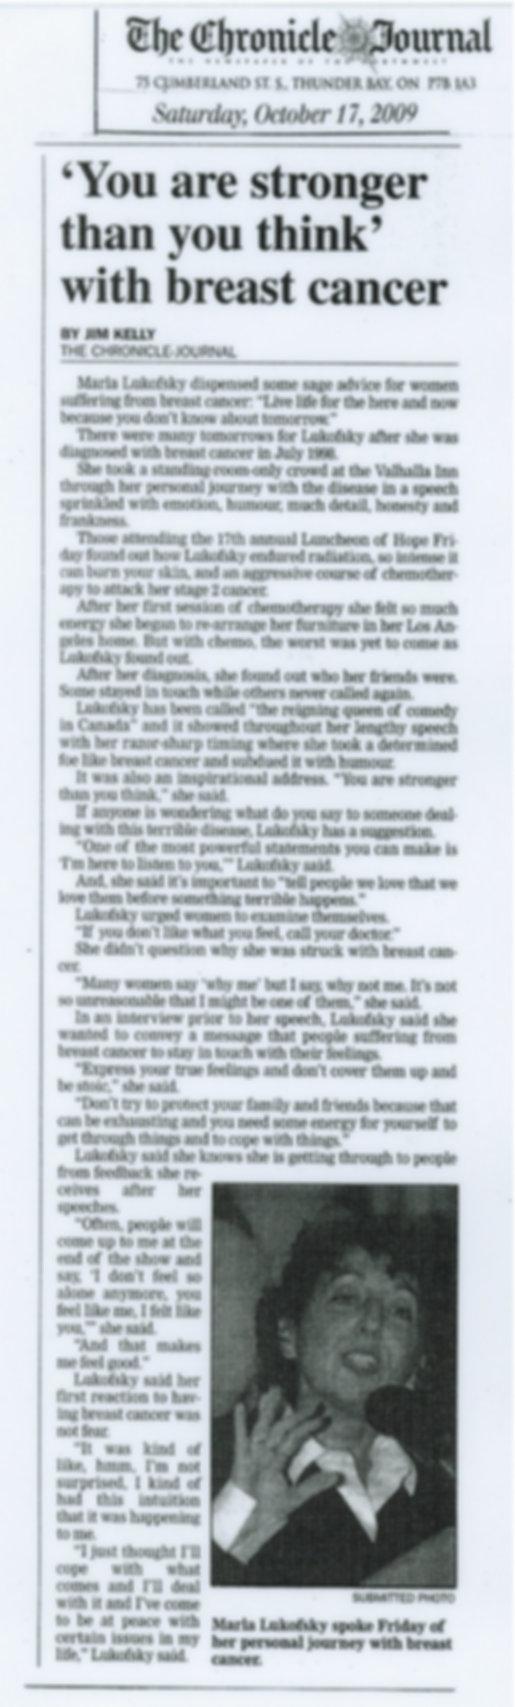 2009 Thunder Bay Chronicle Journal Marla Lukofsky Cancer Comedy